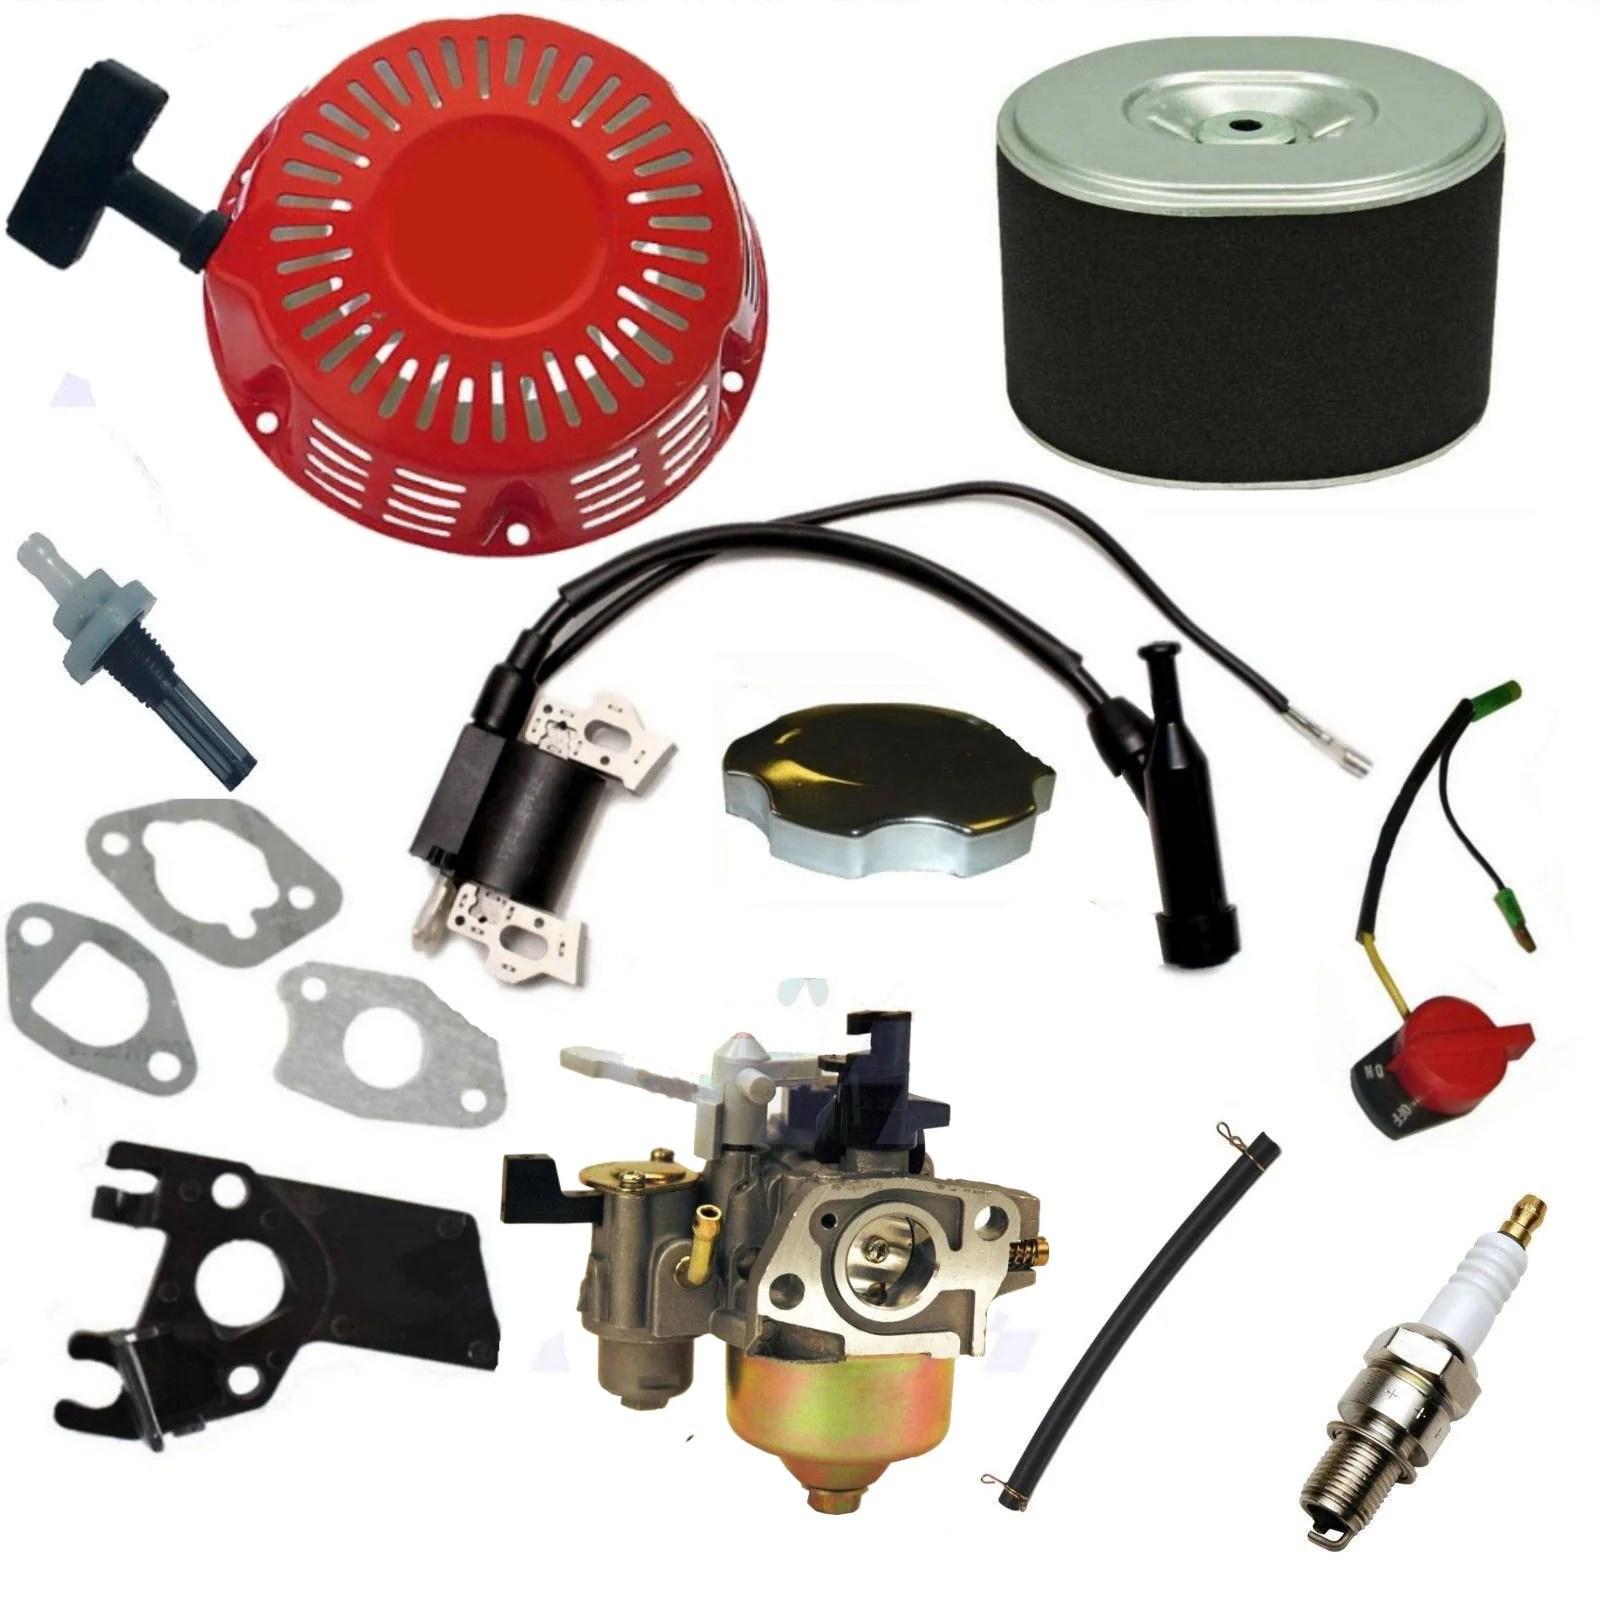 new honda gx390 recoil carburetor ignition coil spark plug air honda gx390 solenoid honda gx390 wiring plug [ 1600 x 1600 Pixel ]